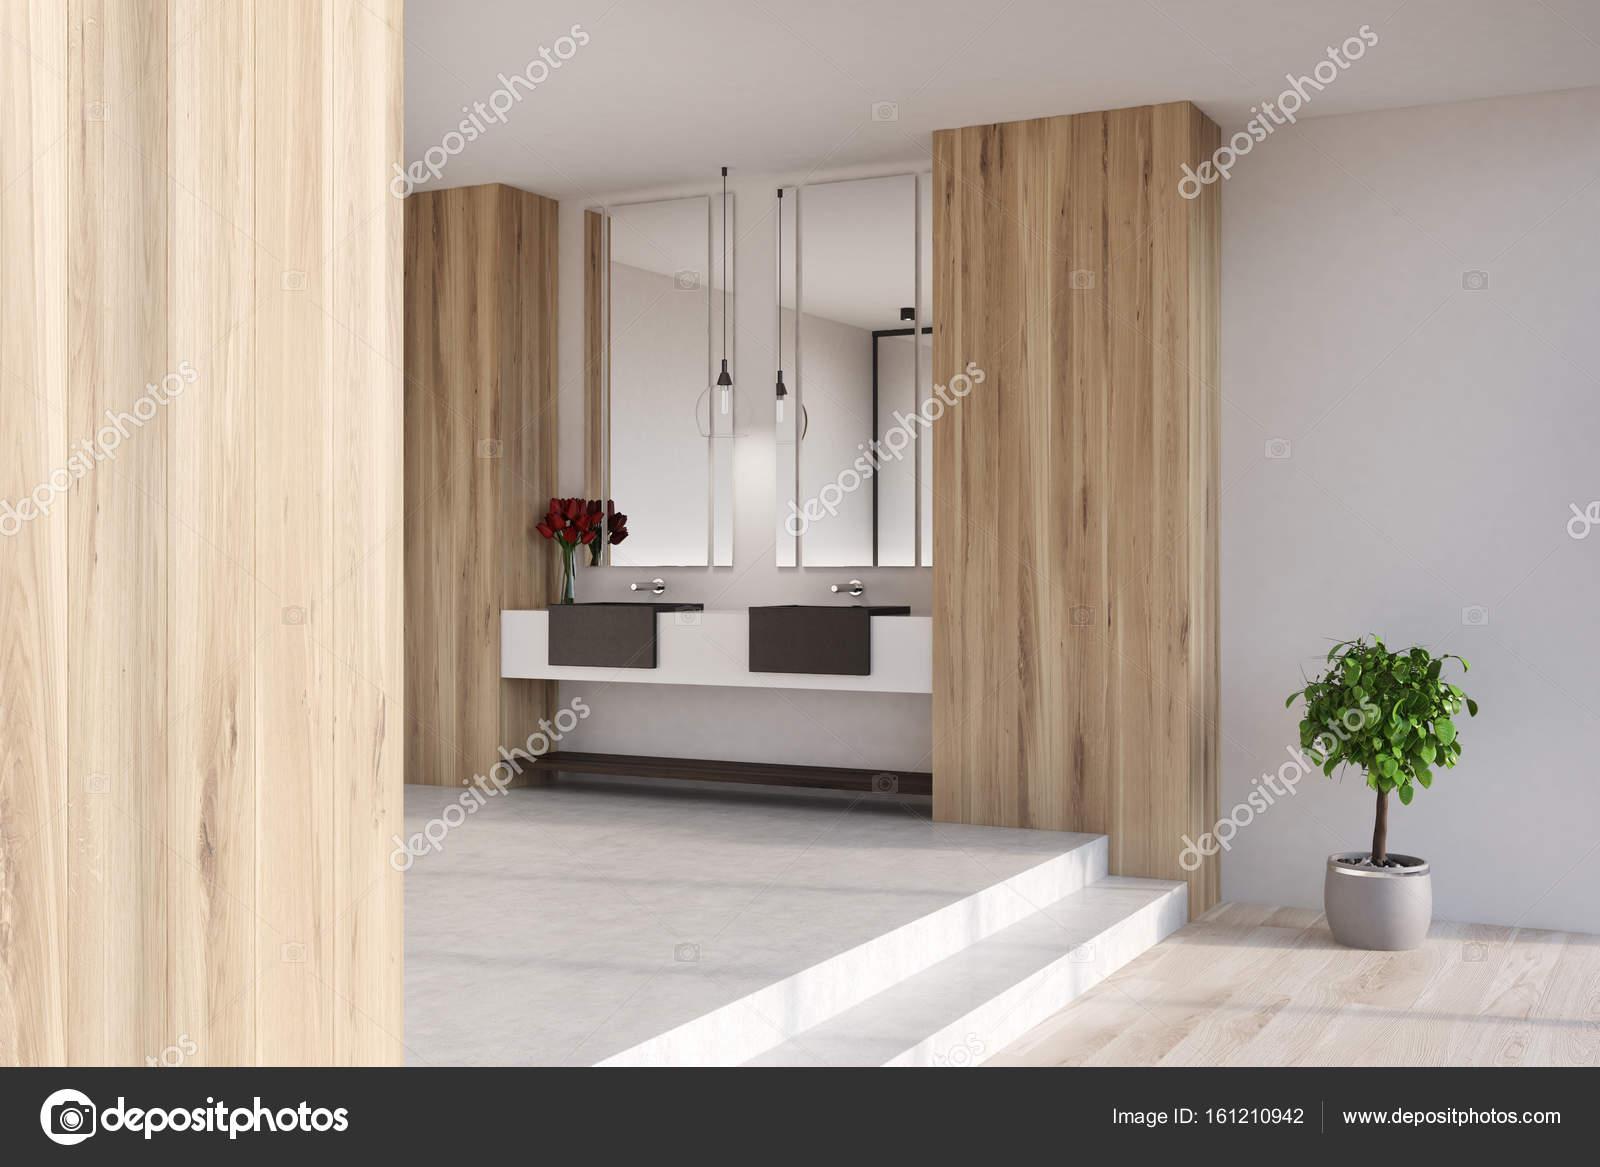 https://st3.depositphotos.com/2673929/16121/i/1600/depositphotos_161210942-stockafbeelding-houten-badkamer-dubbele-wastafel-kant.jpg